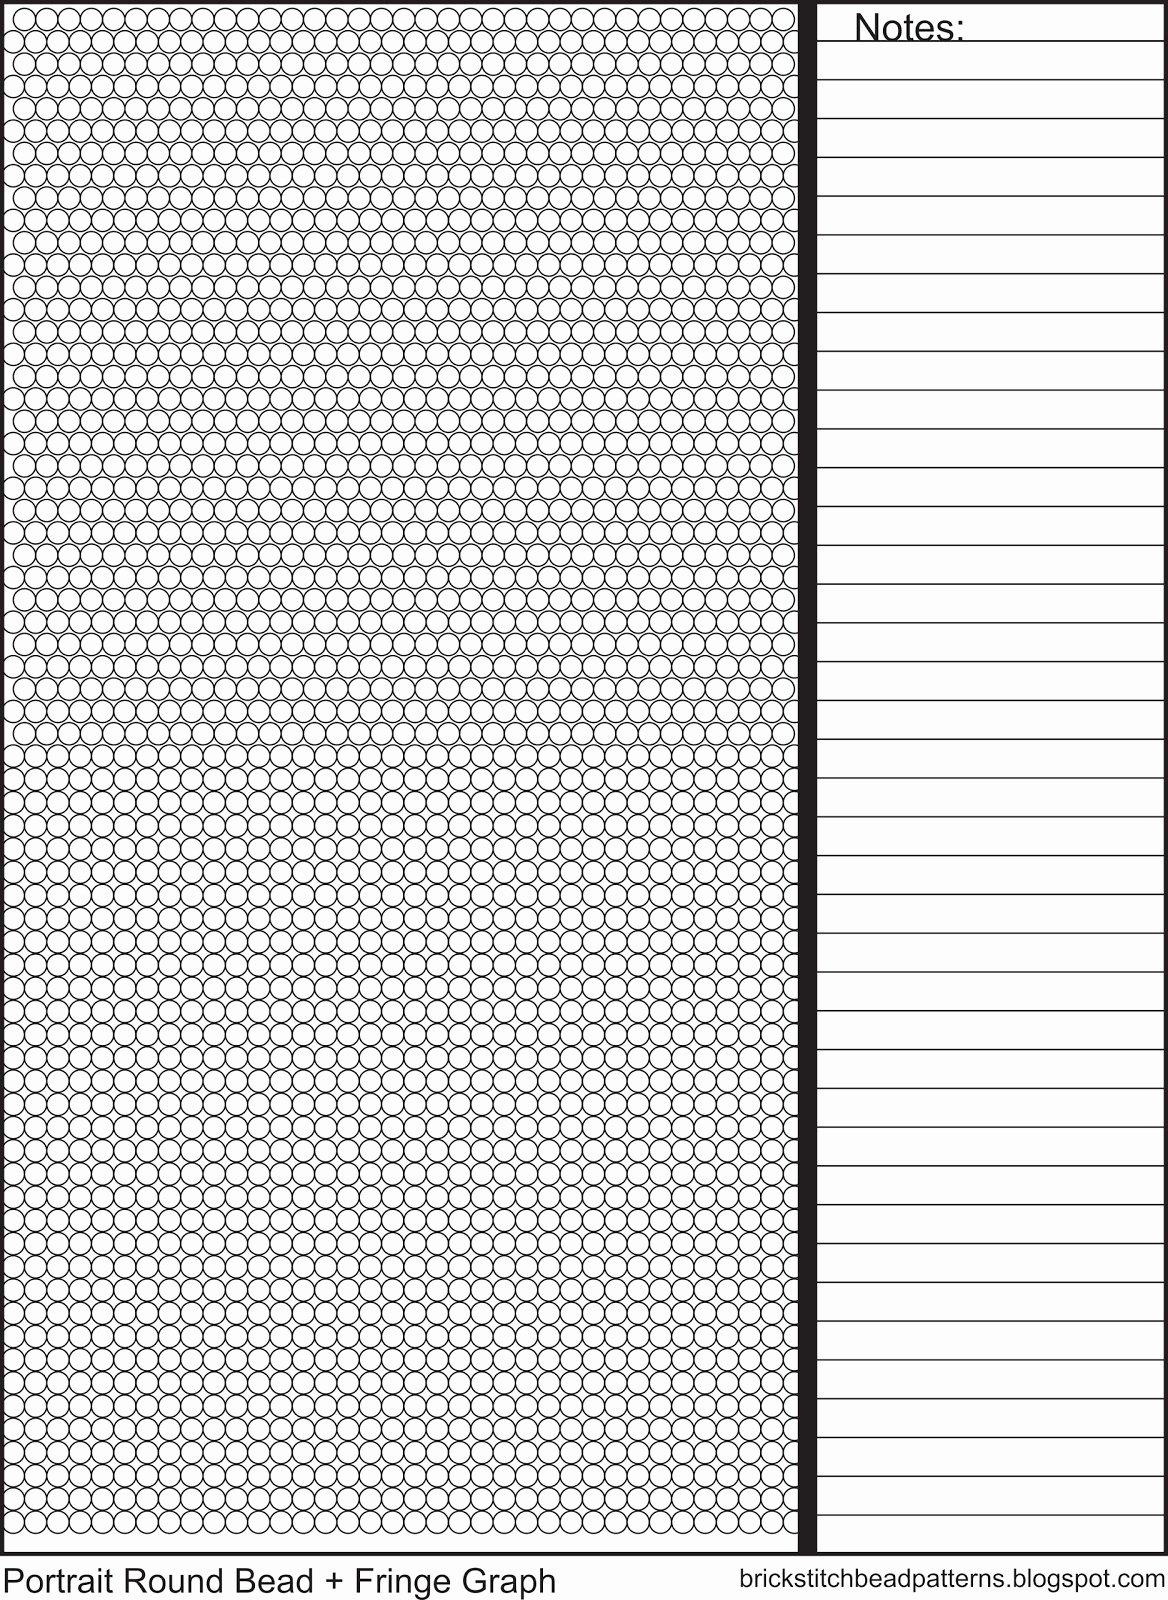 Printable Brick Pattern Unique Brick Stitch Bead Patterns Journal Universal Round Seed